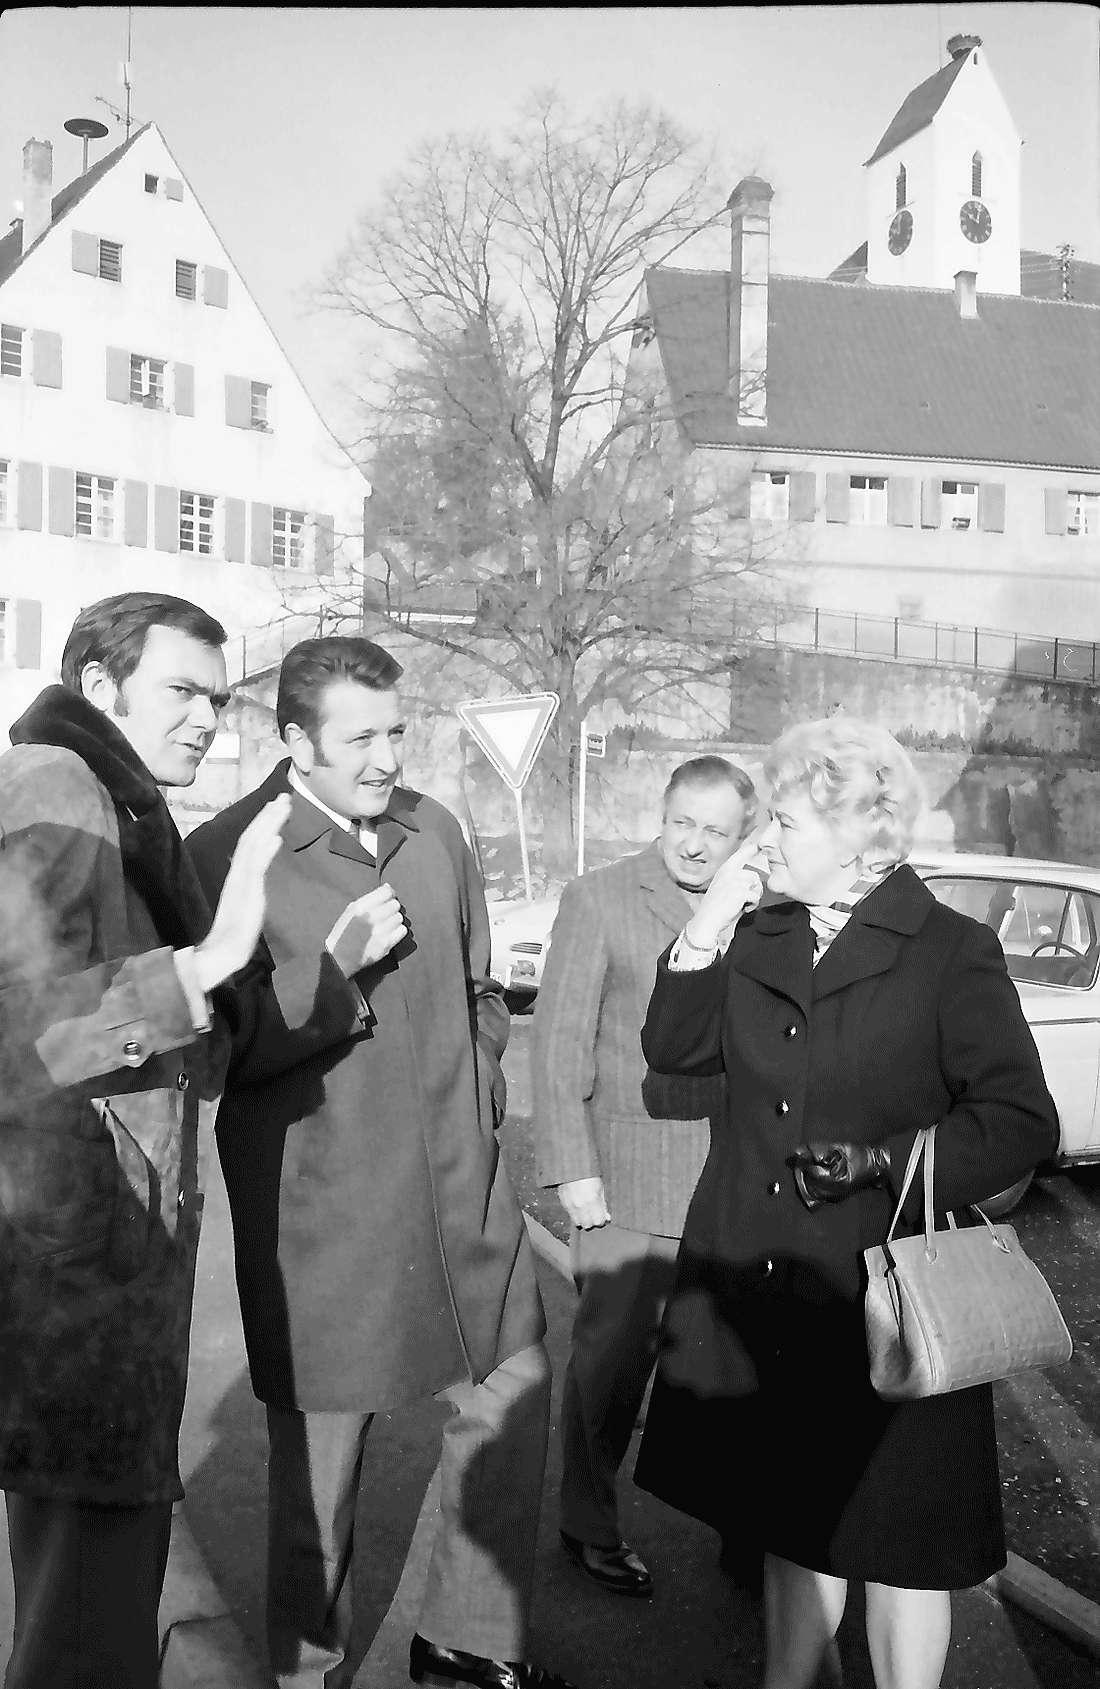 Opfingen: Gruppen mit Bürgermeister Höfflin, Bild 1